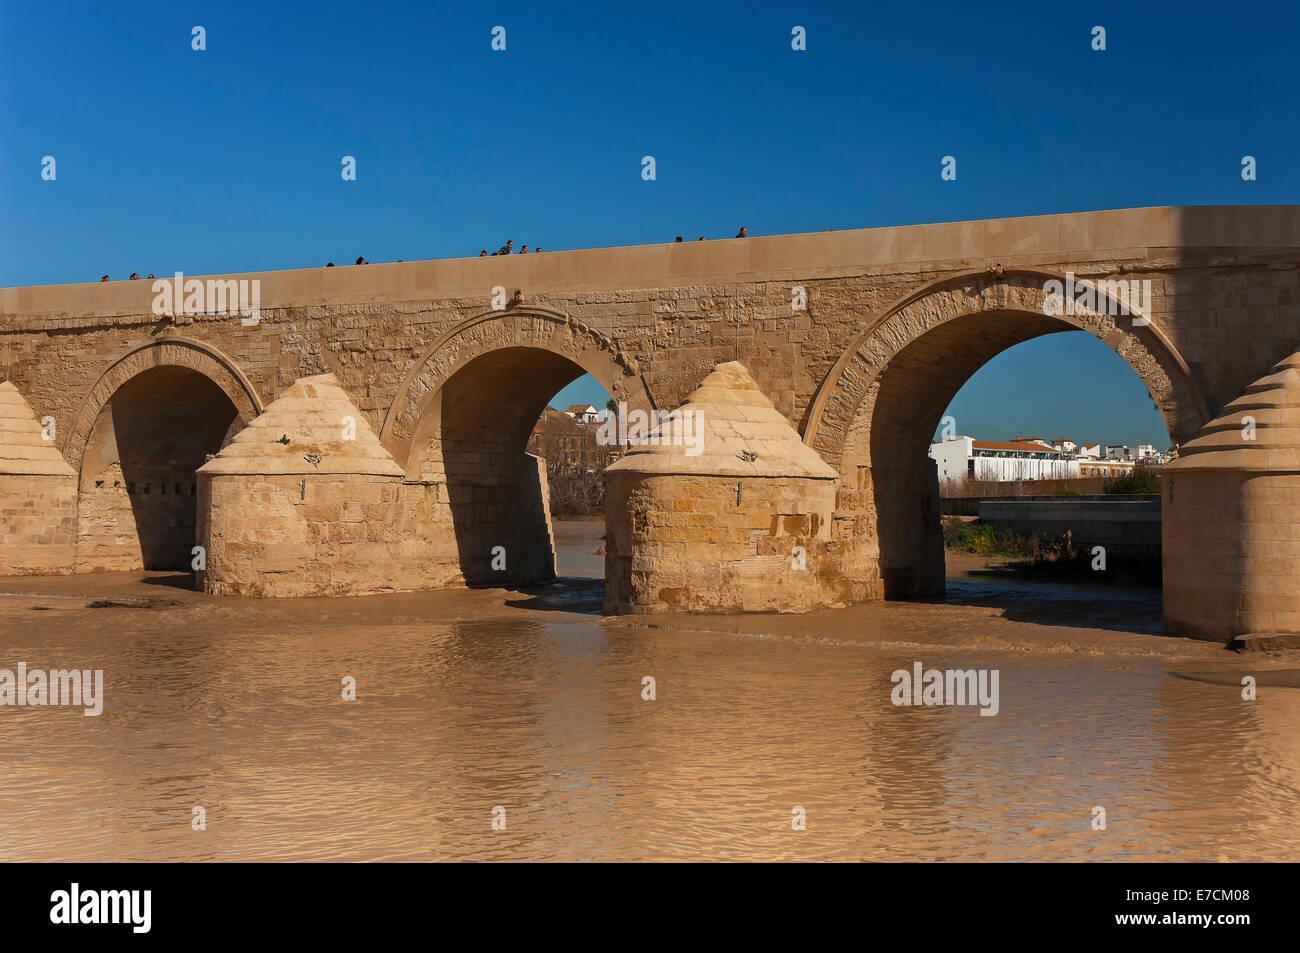 Roman Bridge and Guadalquivir river- 1st century, Cordoba, Region of Andalusia, Spain, Europe - Stock Image